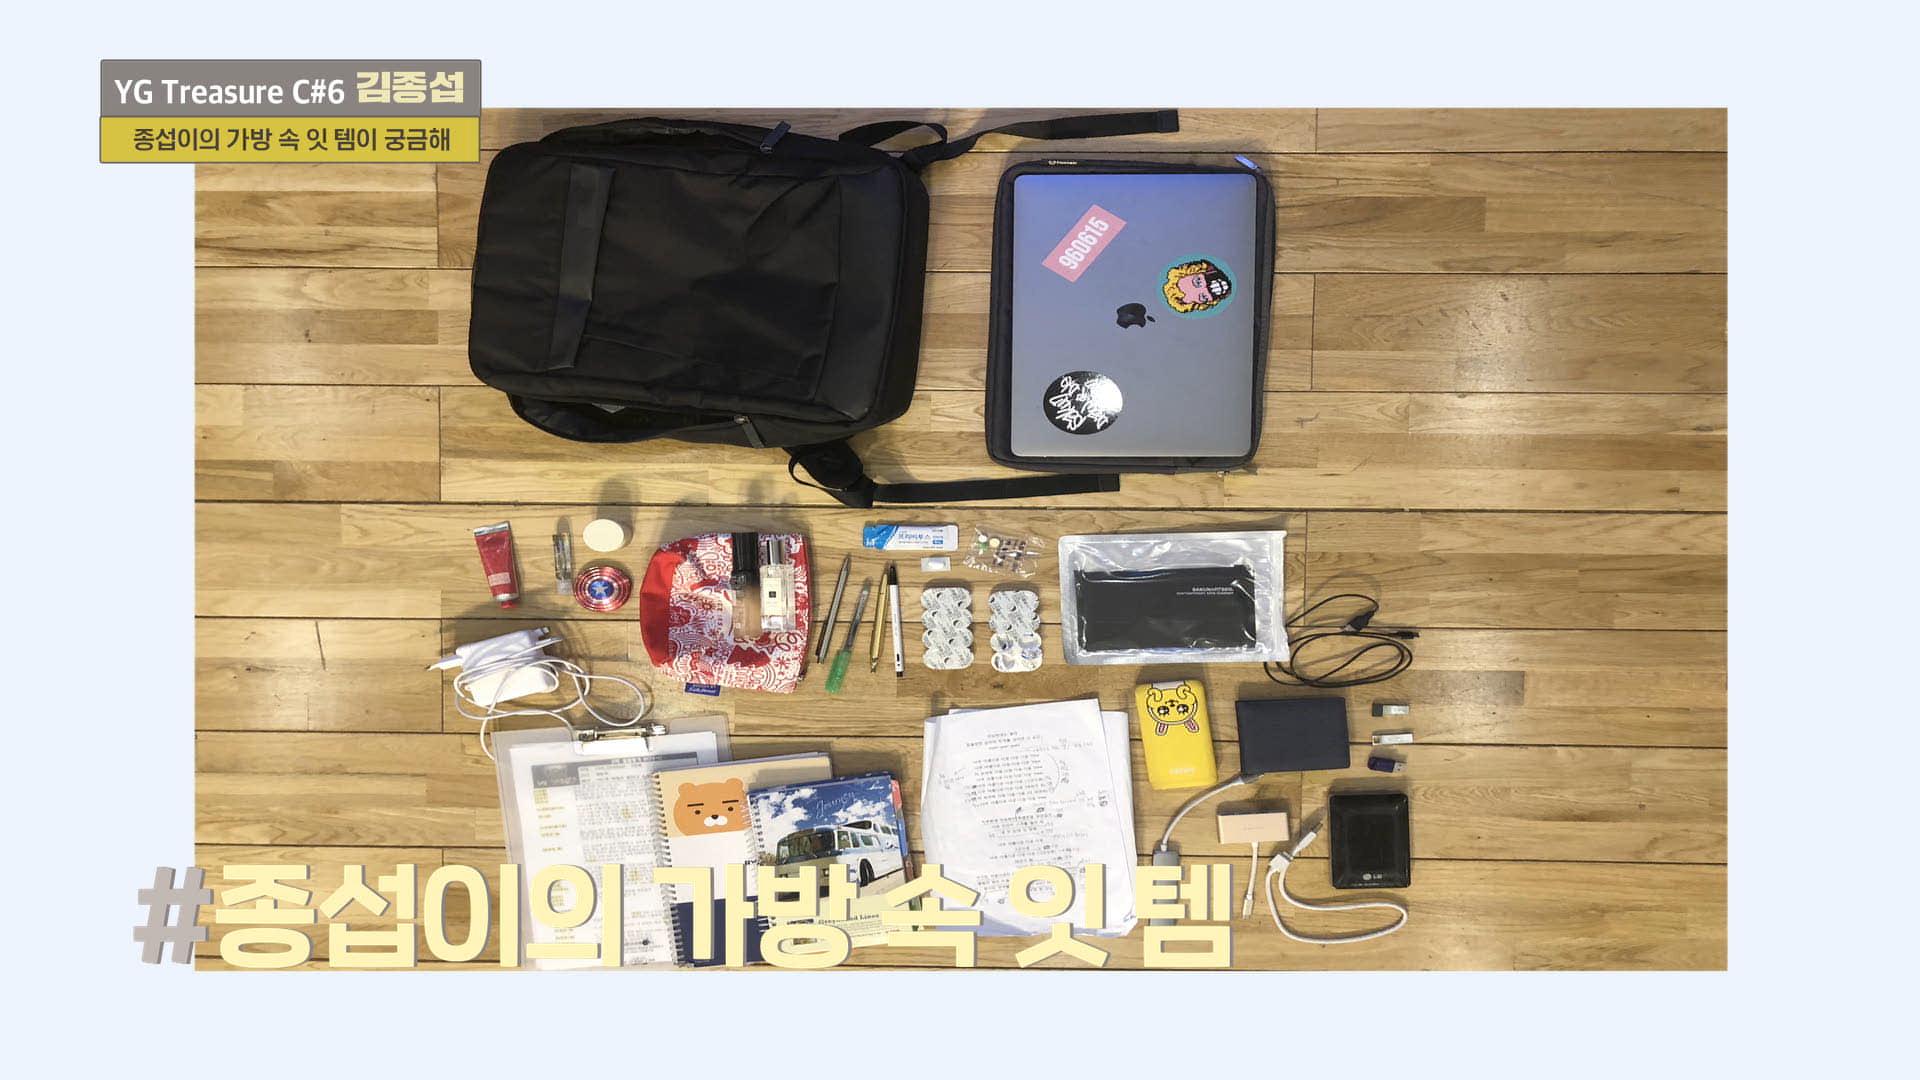 [IN MY BAG] 김종섭 <KIM JONGSEOB> l YG보석함